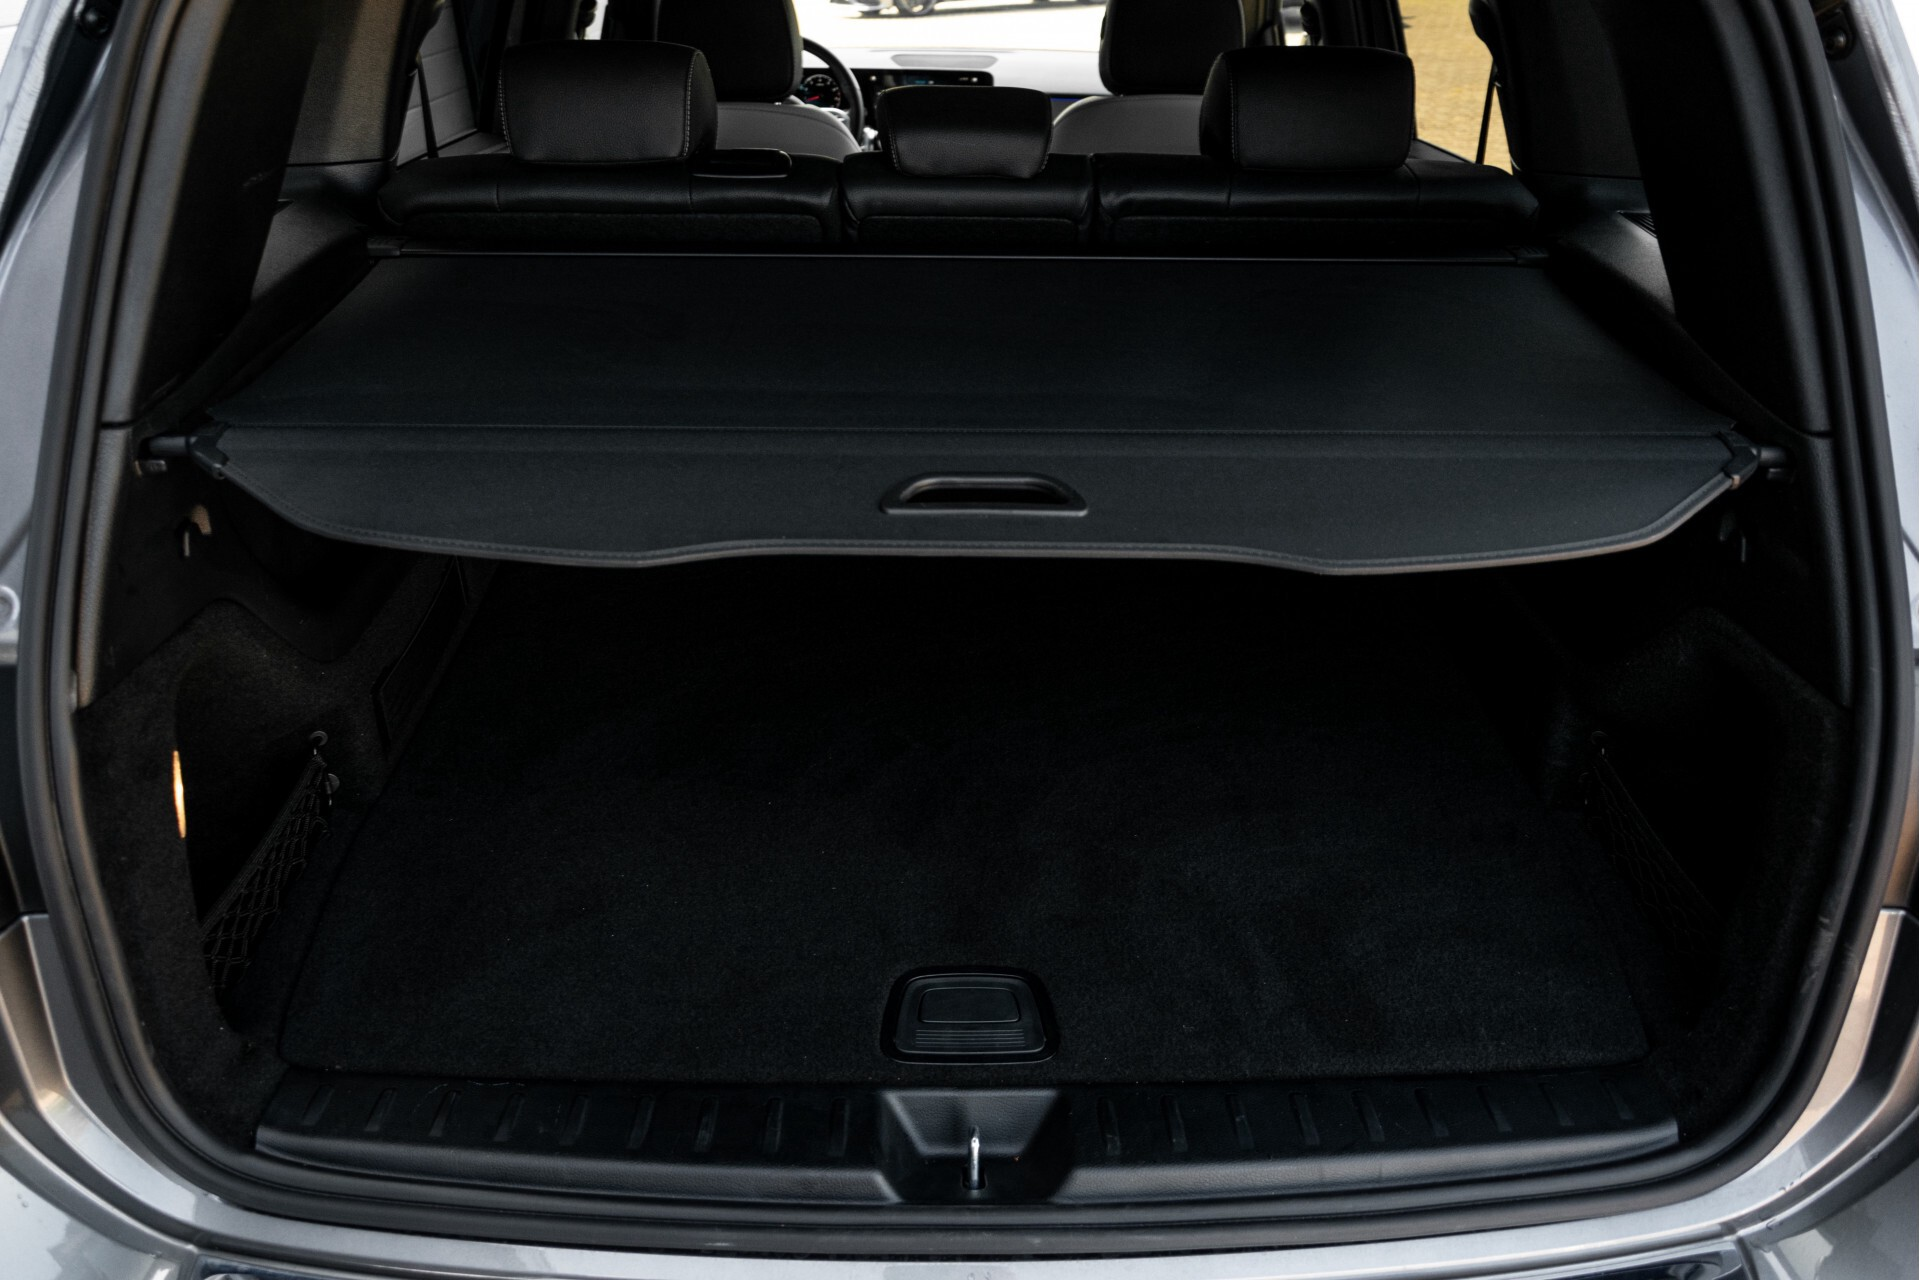 Mercedes-Benz GLB 250 4-M AMG Night/Distronic/Keyless/Mem/Geventileerde stoelen/Burmester/Pano Aut8 Foto 53